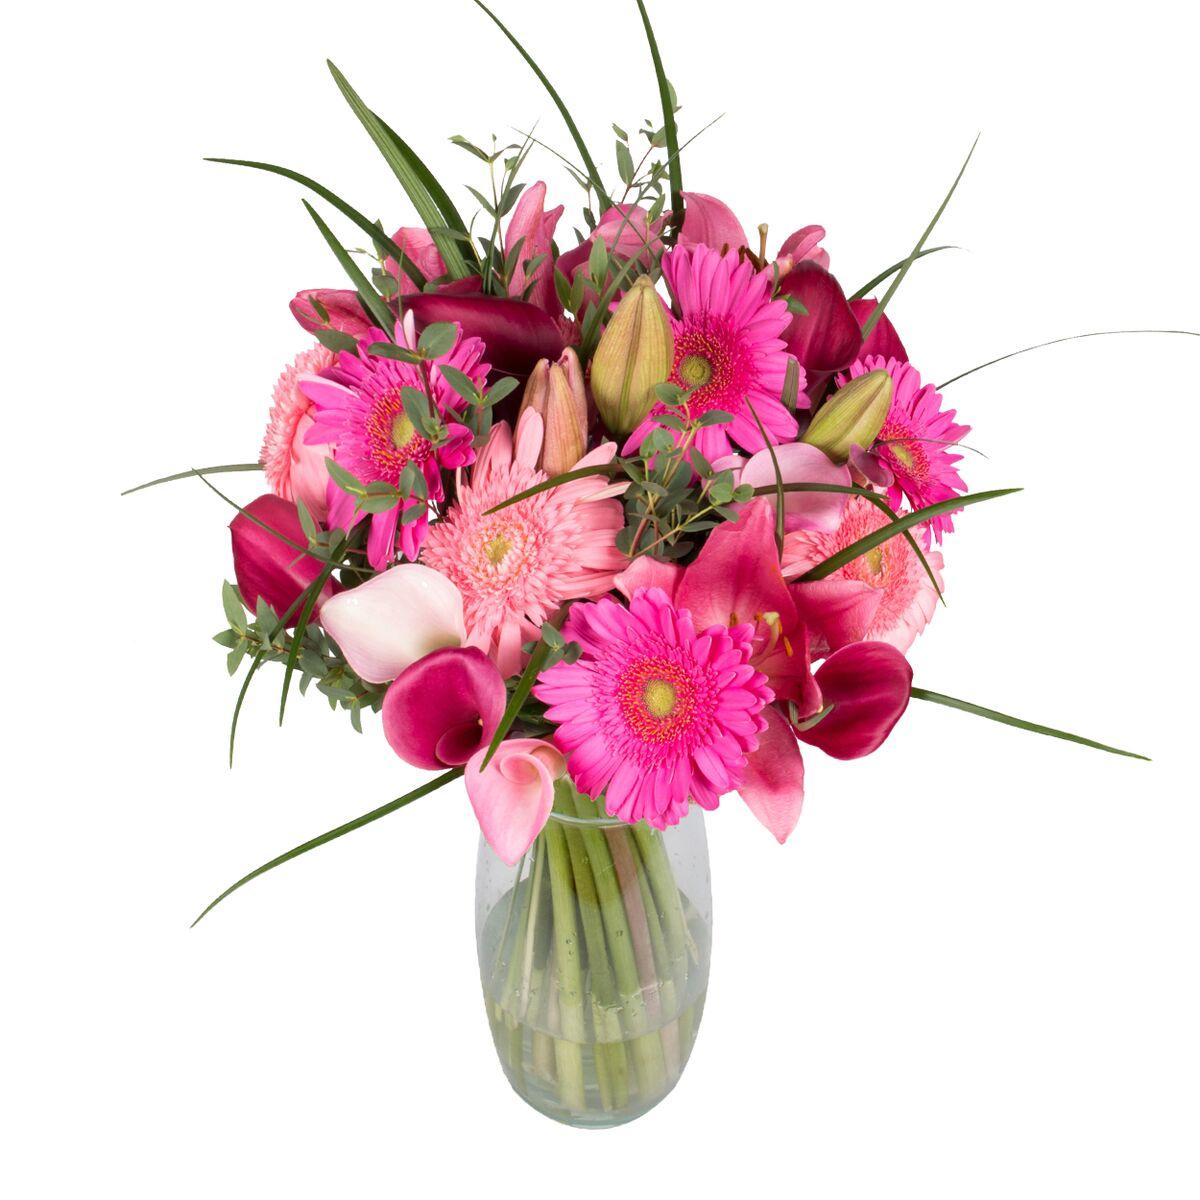 Pink Emma Bouquet - 33 Stems